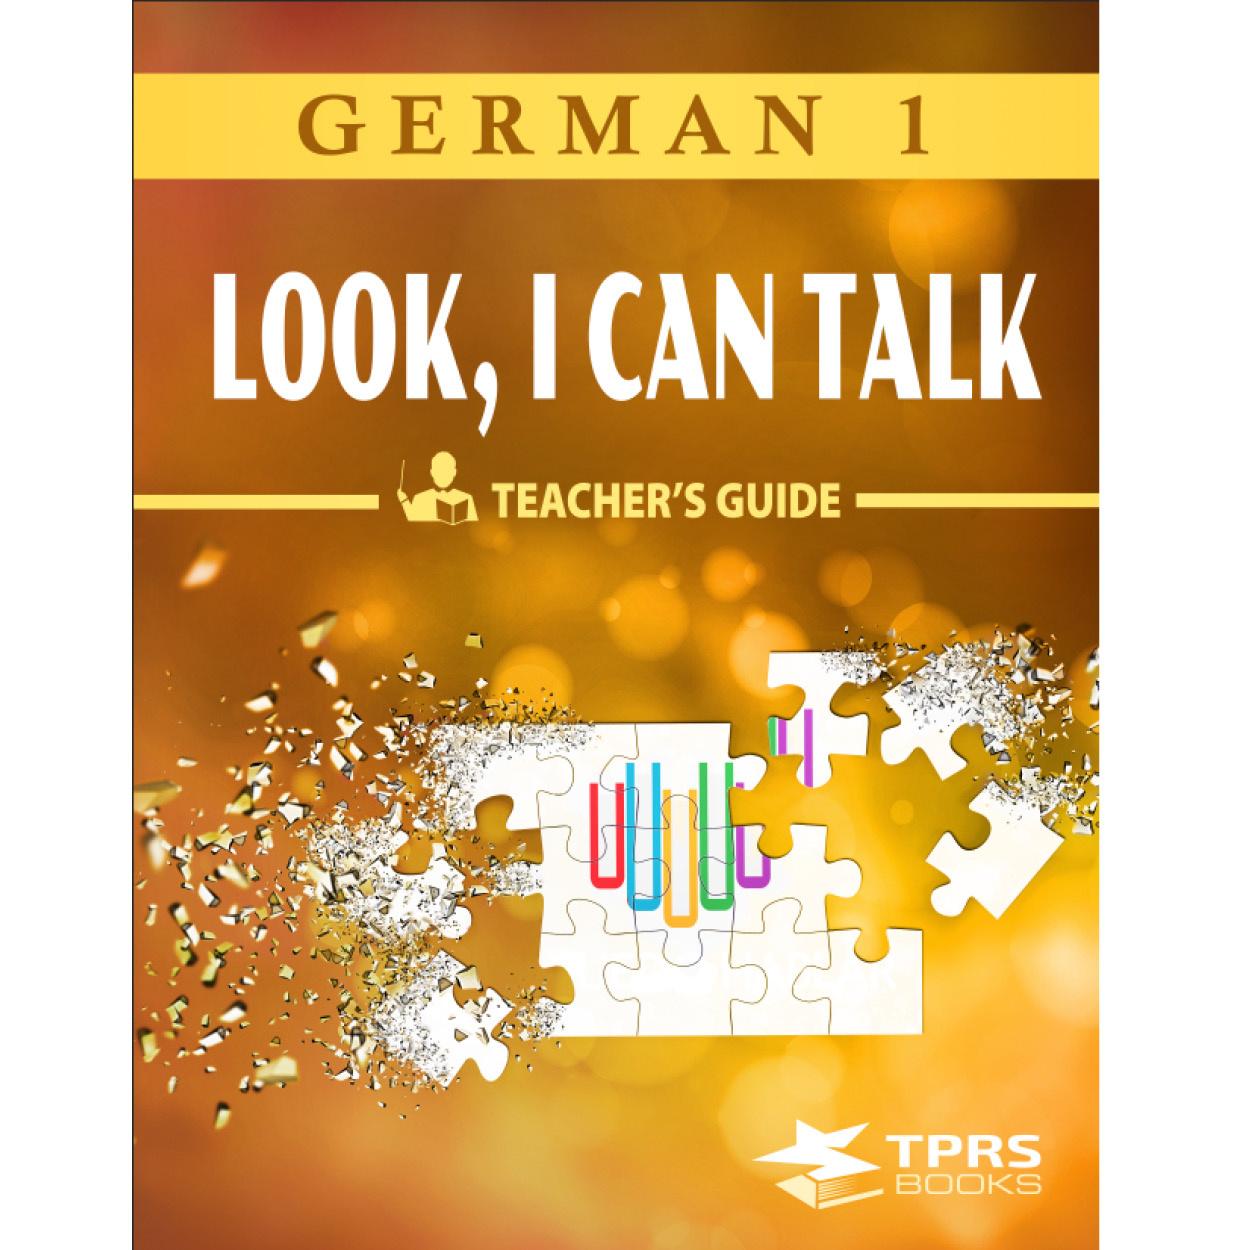 German 1 - Look, I can talk! Teacher's Guide